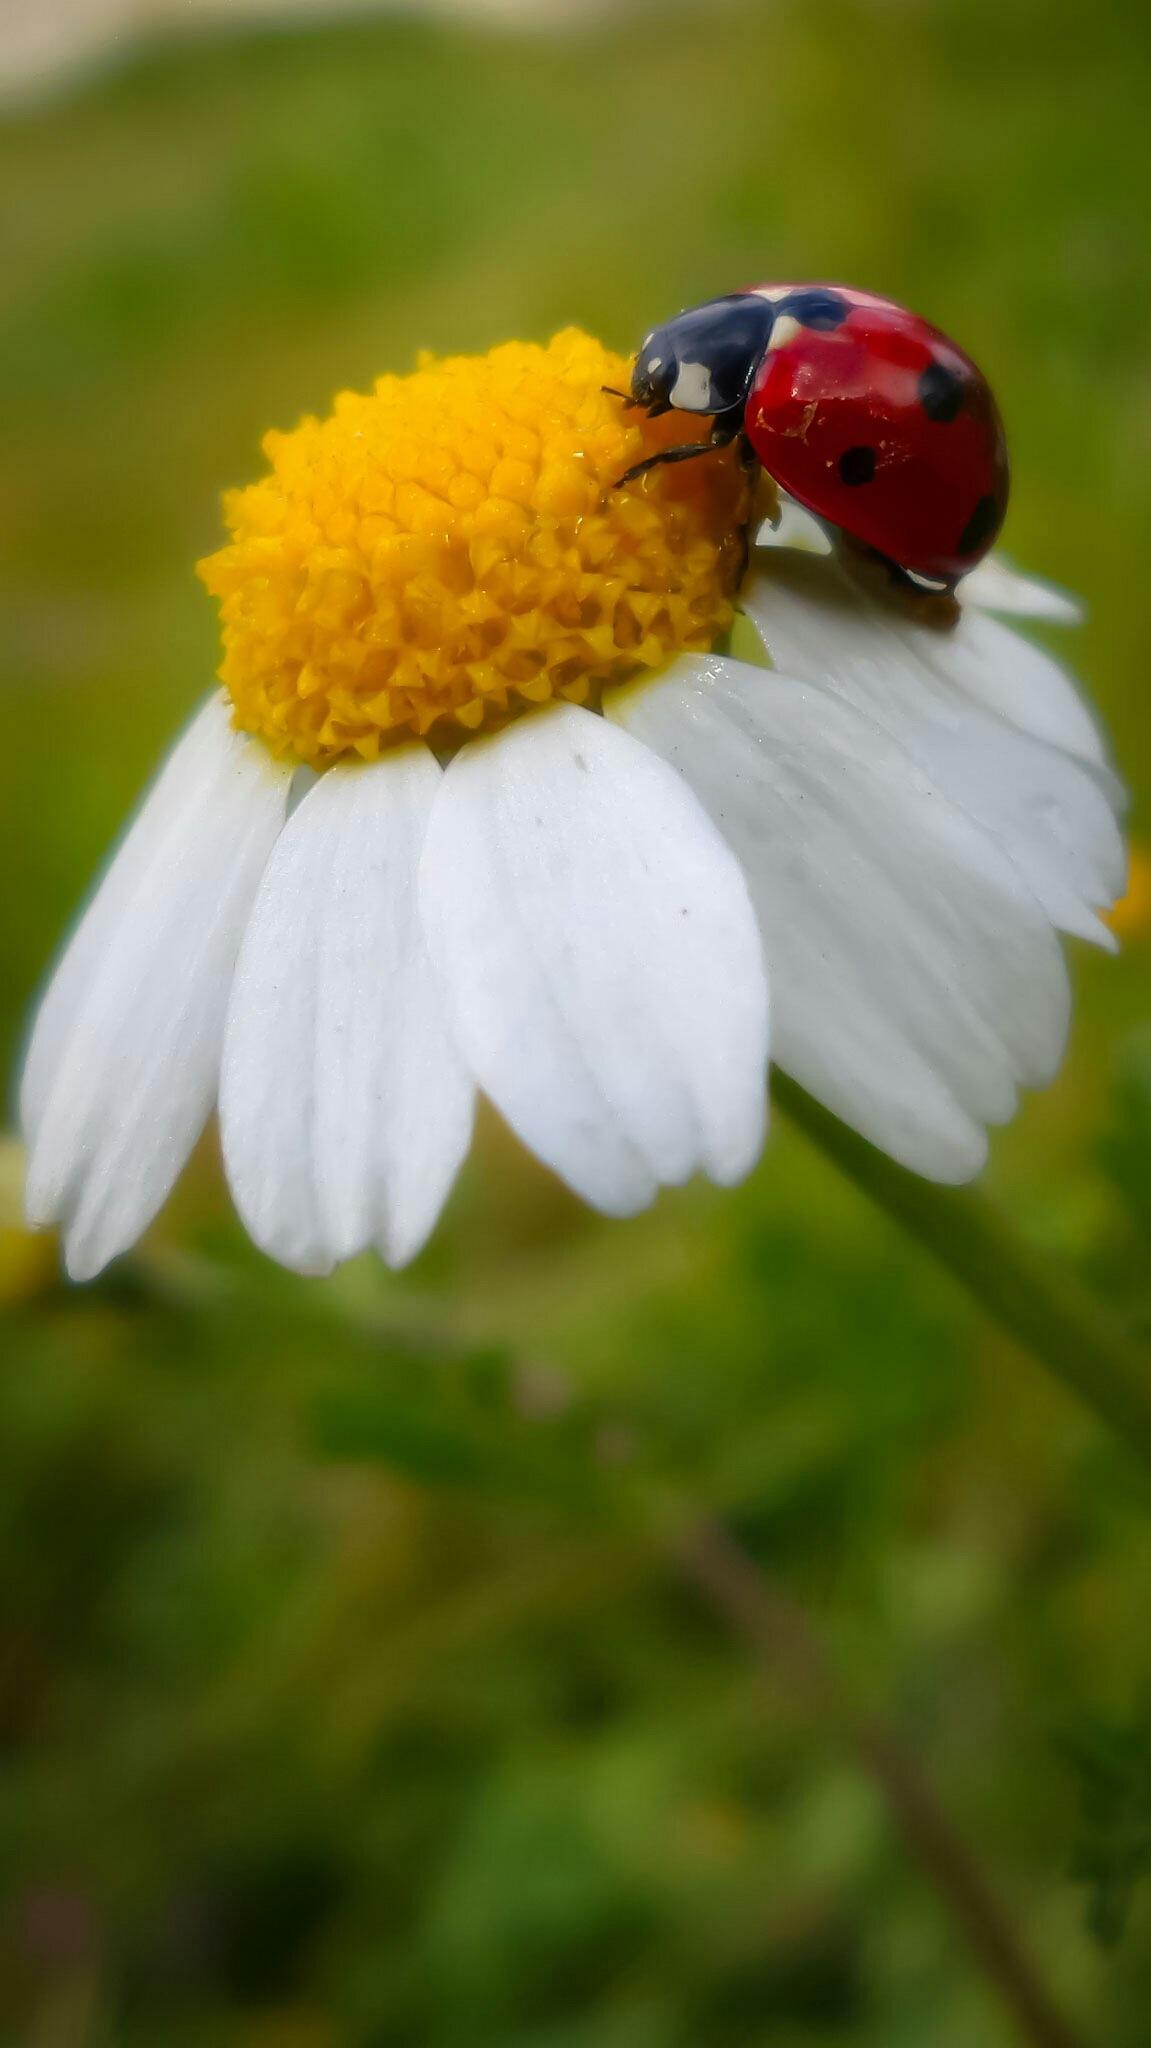 Ladybird by Noor Eddeen Alothman